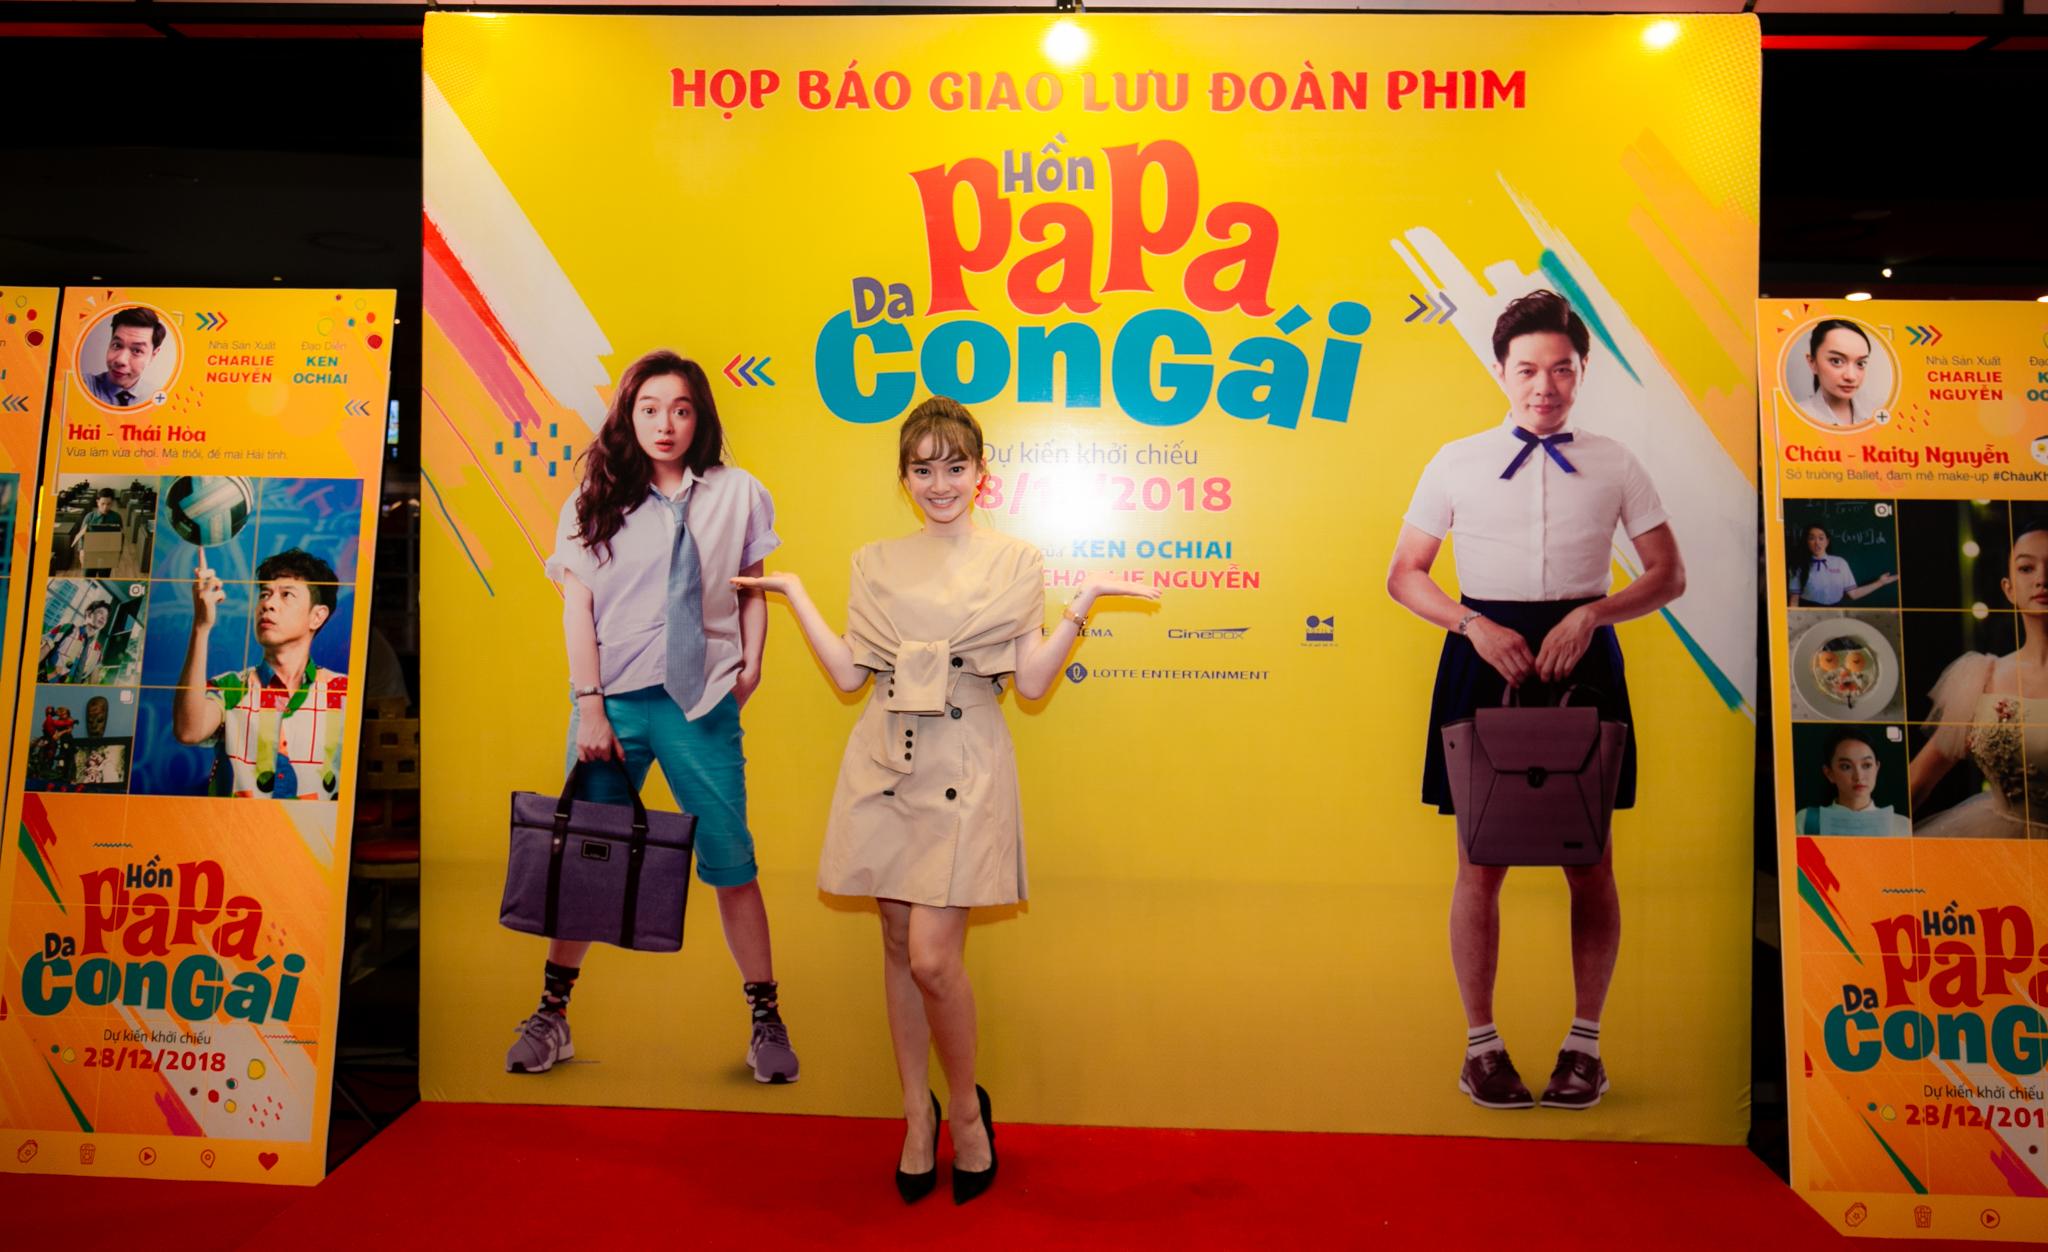 showcase giới thiệu Hồn Papa Da Con Gái 6